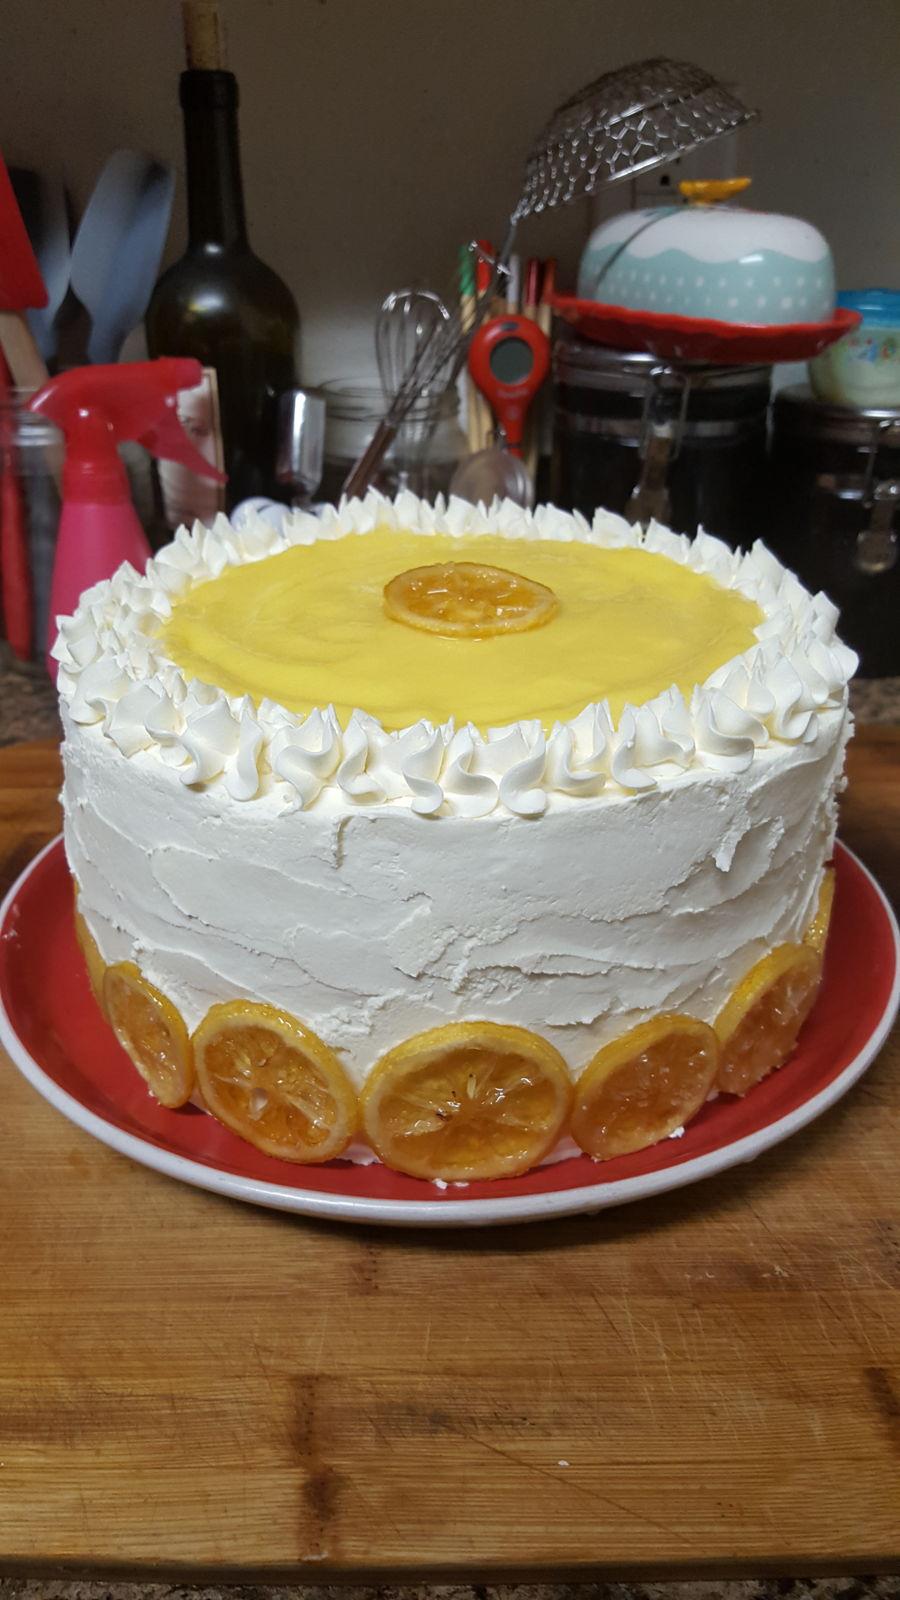 Candied Lemon Cake - CakeCentral.com